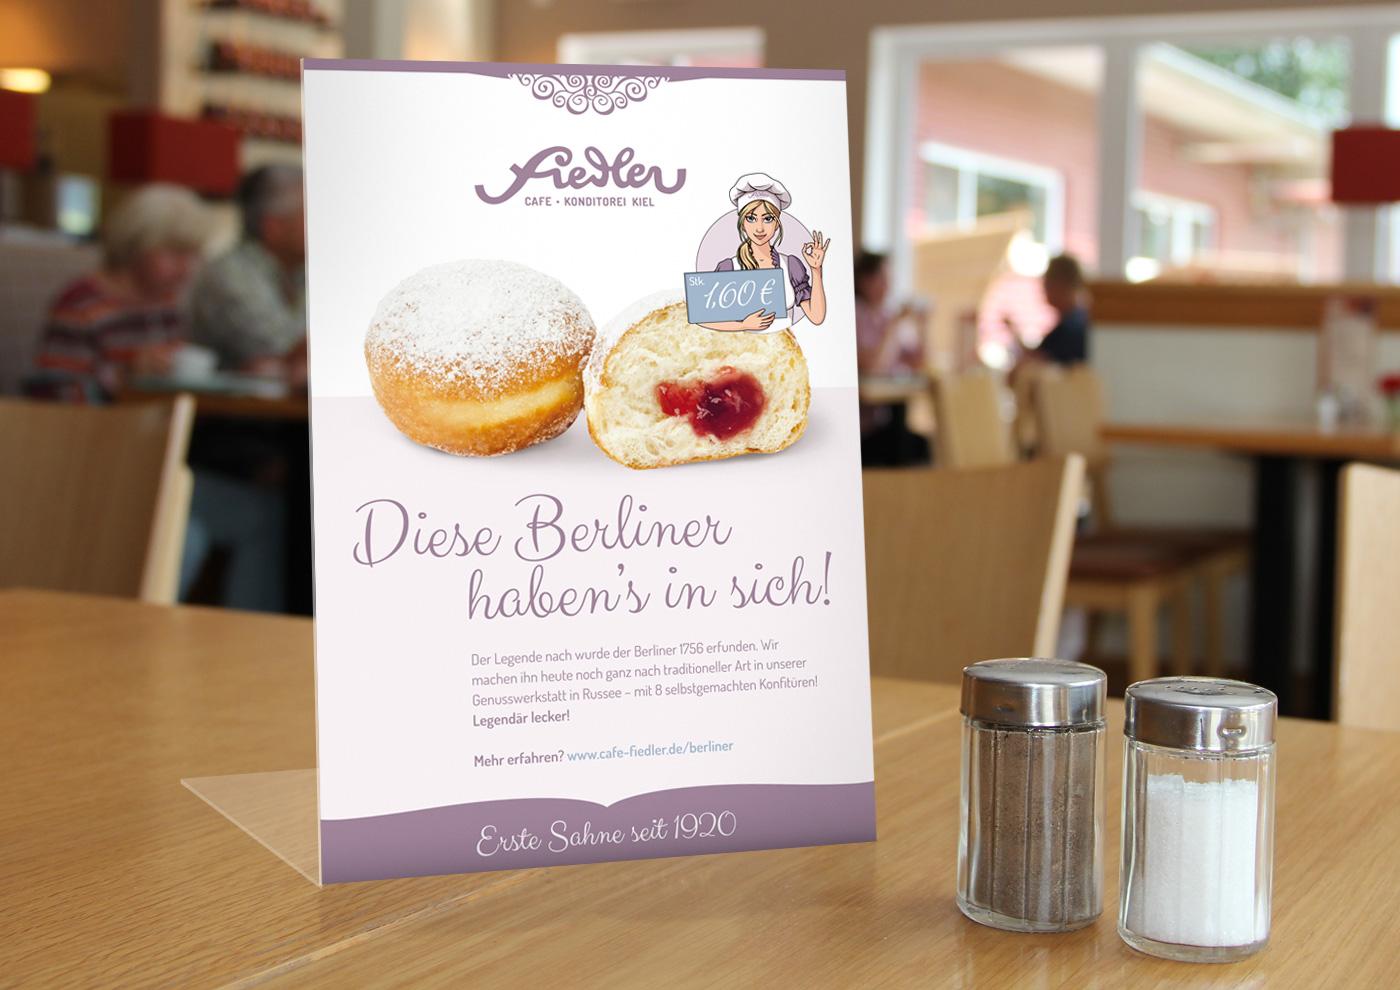 CD-Relaunch, Web und Social Media für Café Fiedler - Tresenaufsteller